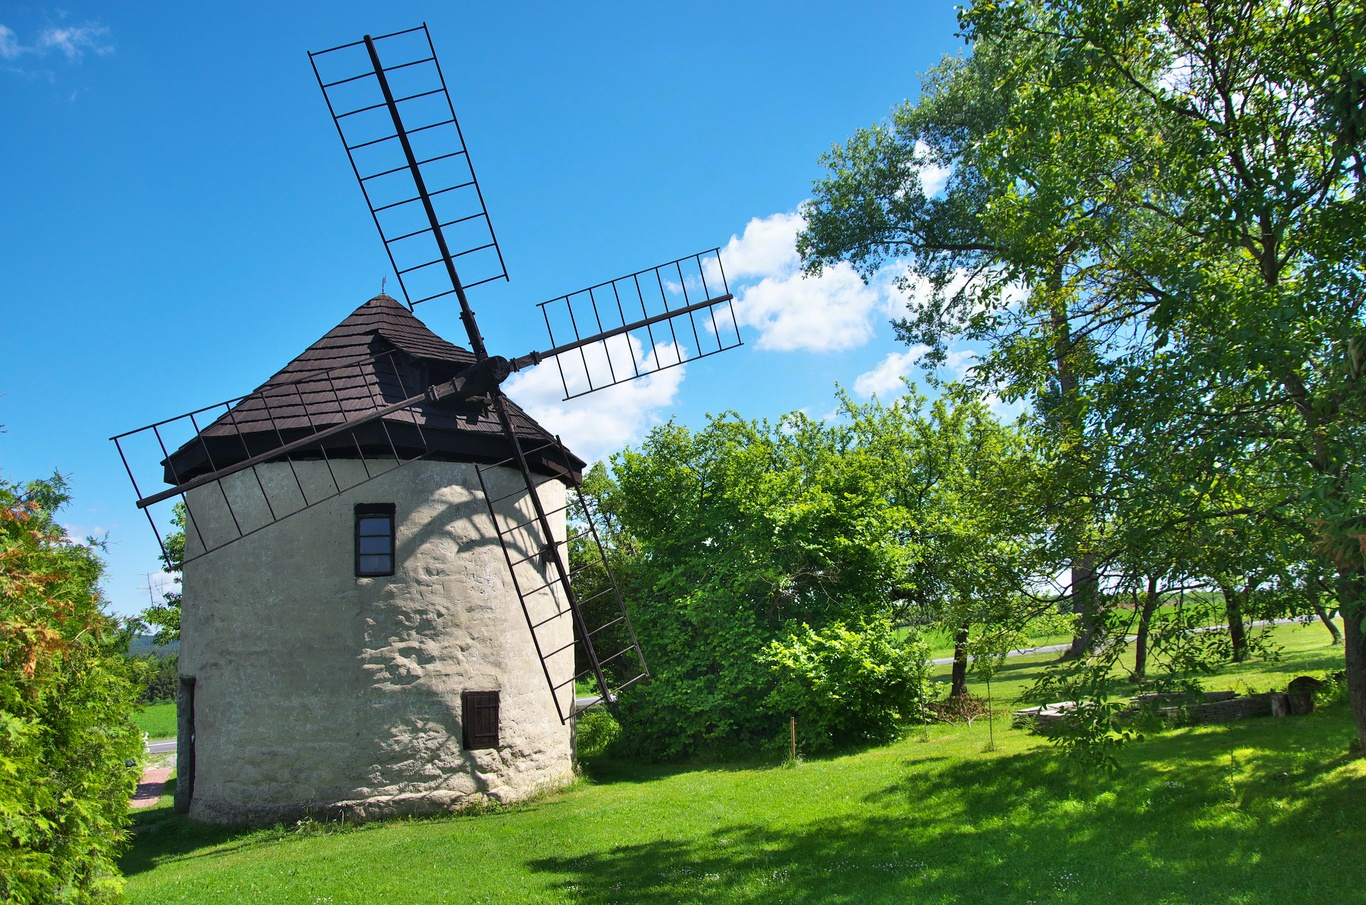 Větrný mlýn Štípa, Zlín